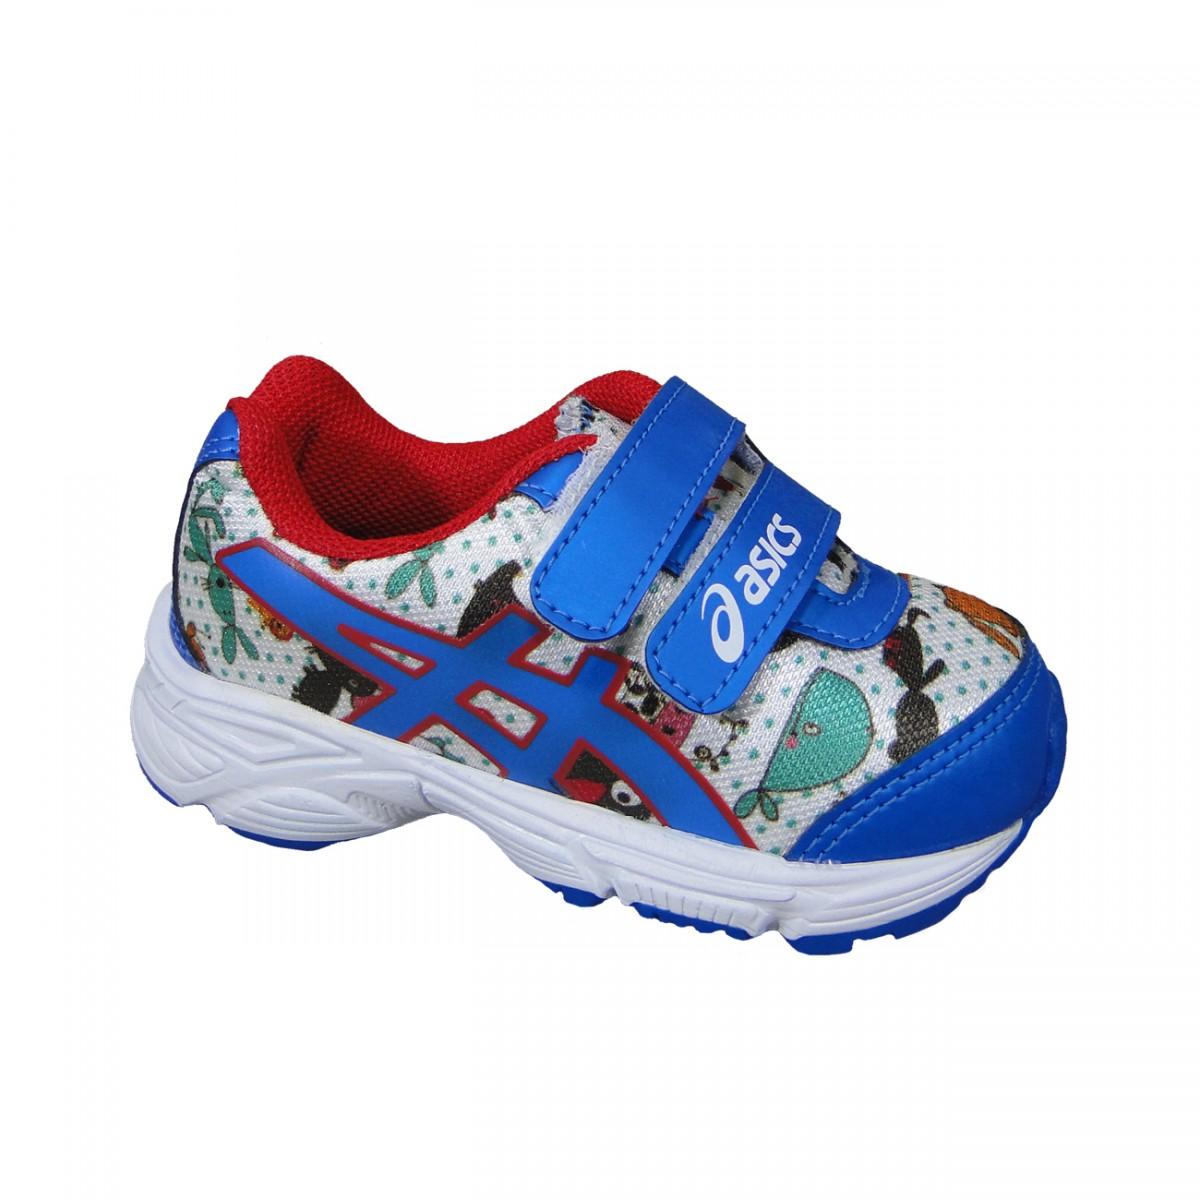 1db4440c6b0 Tenis Asics Sugar Baby TS Infantil C003A 0142 - Branco Azul Vermelho -  Chuteira Nike